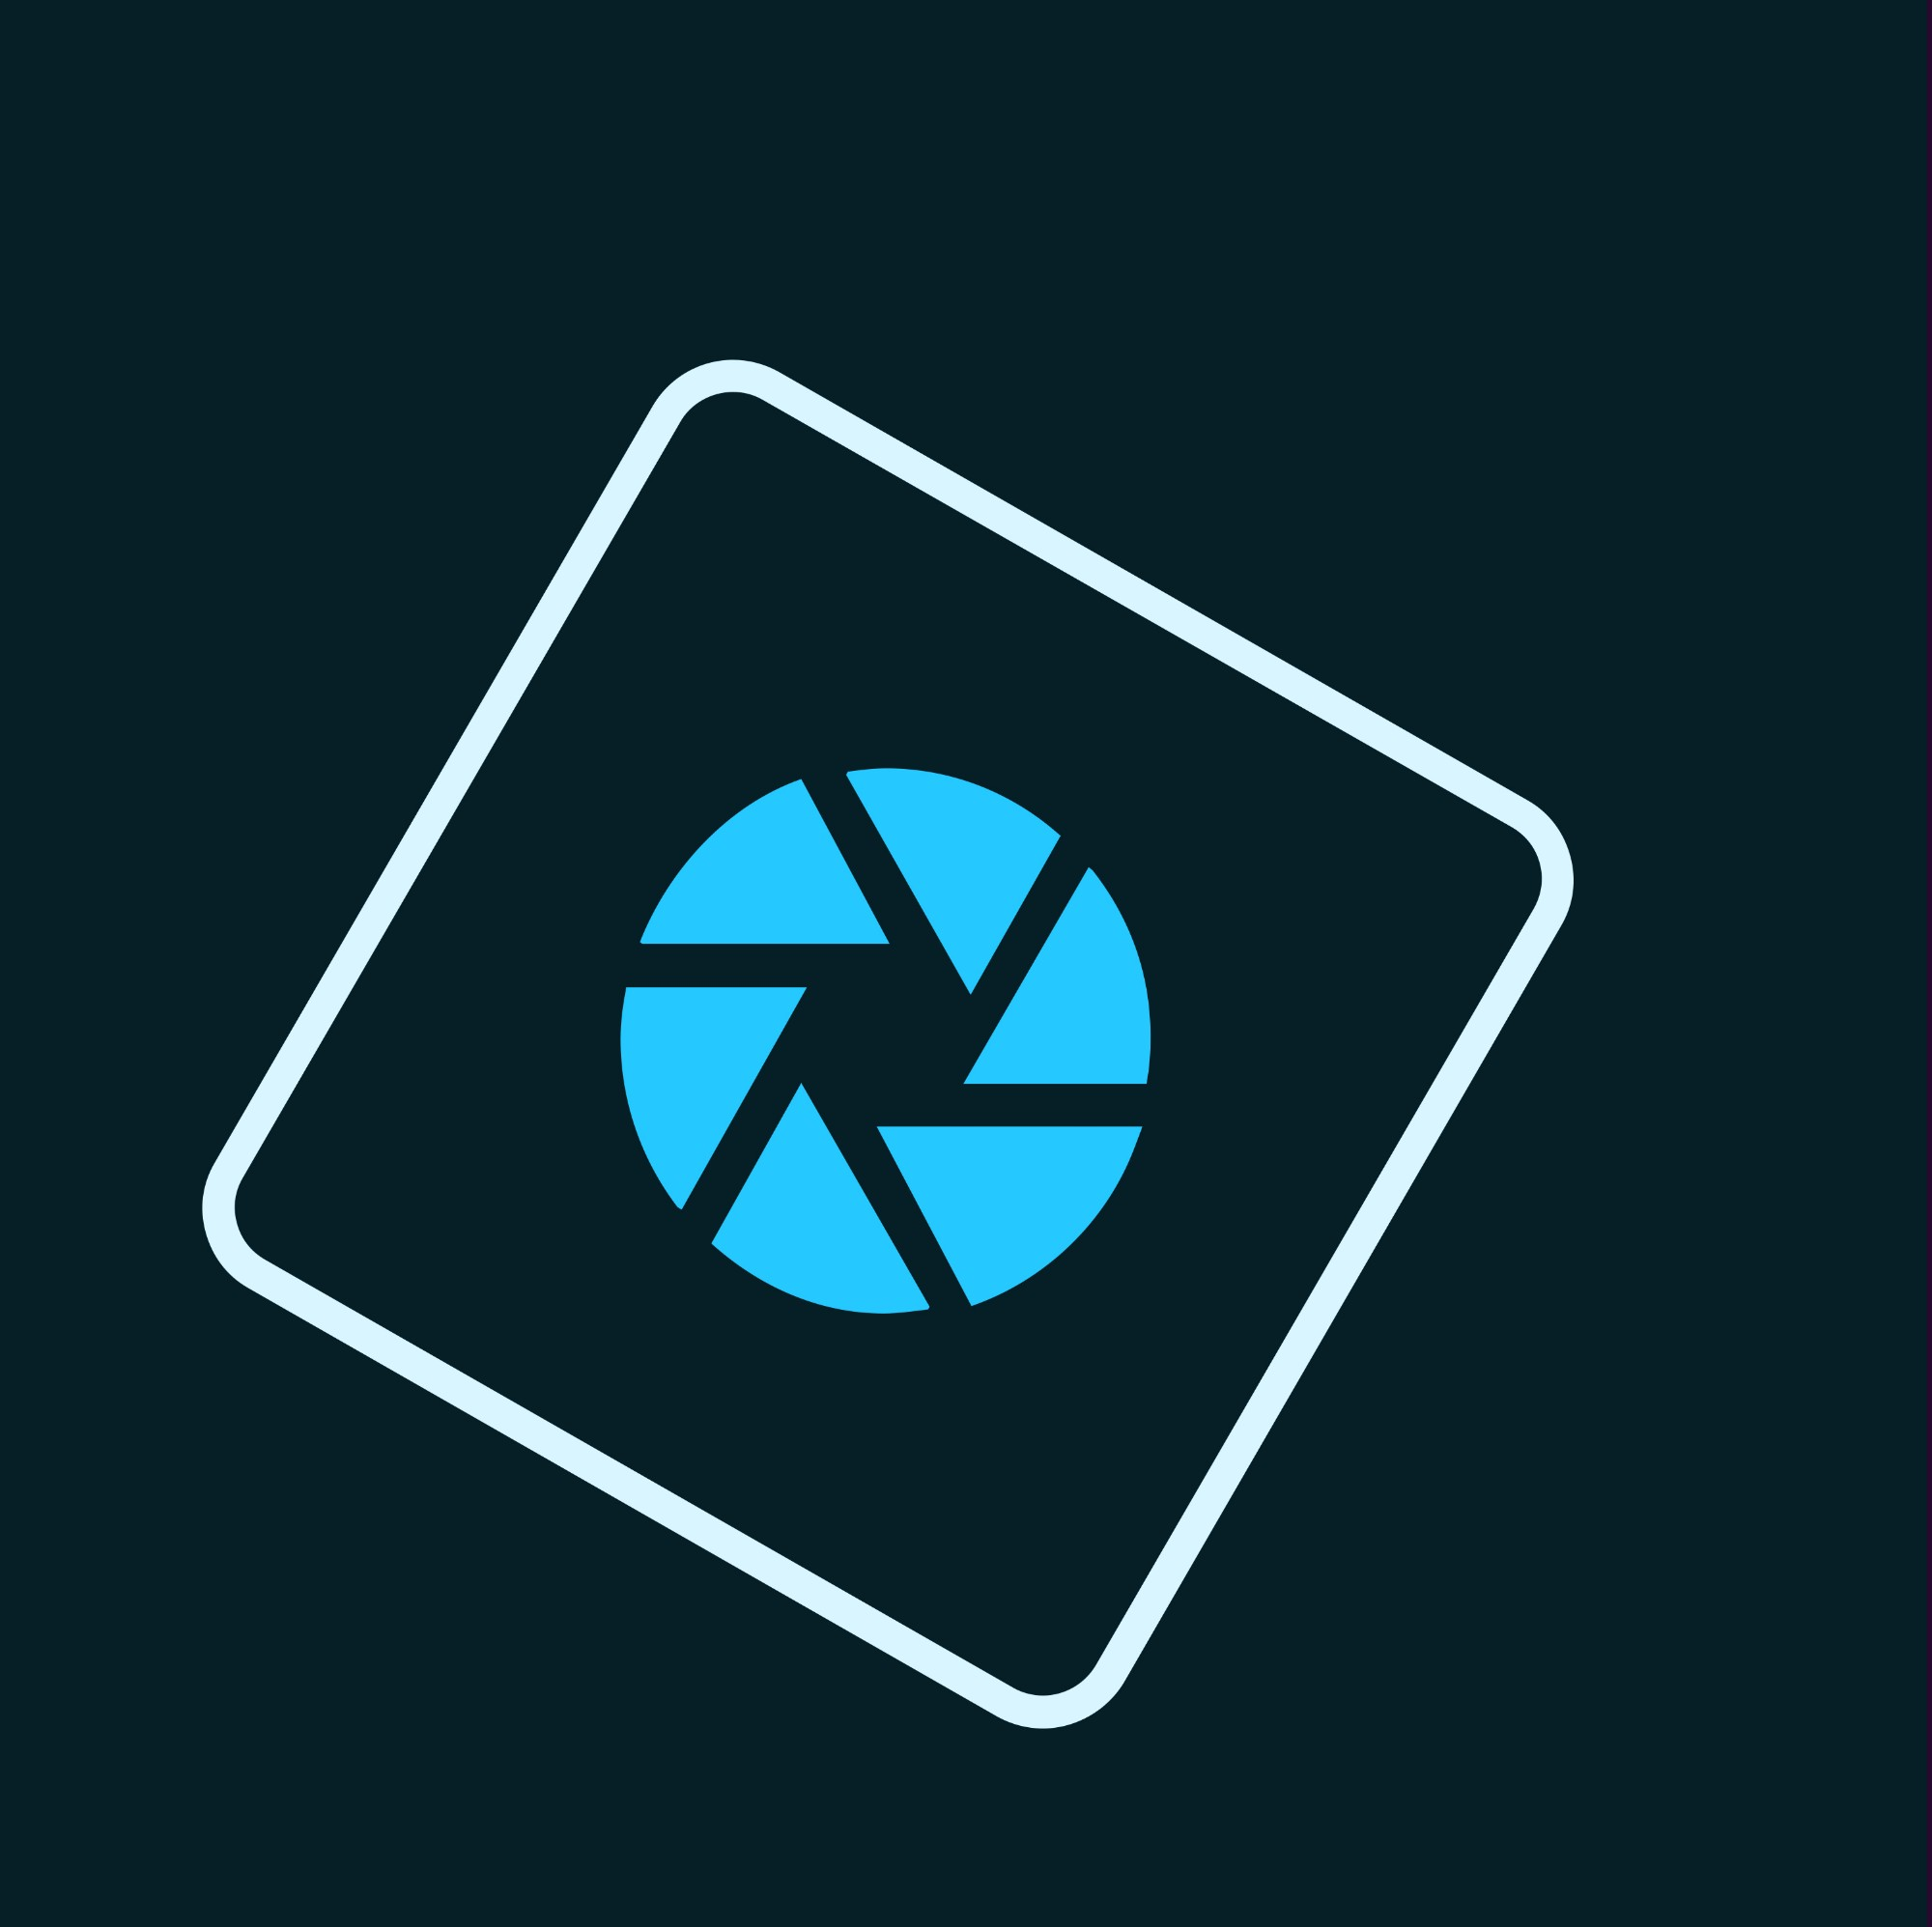 Adobe Photoshop Elements 2021 Mac 1 license(s)